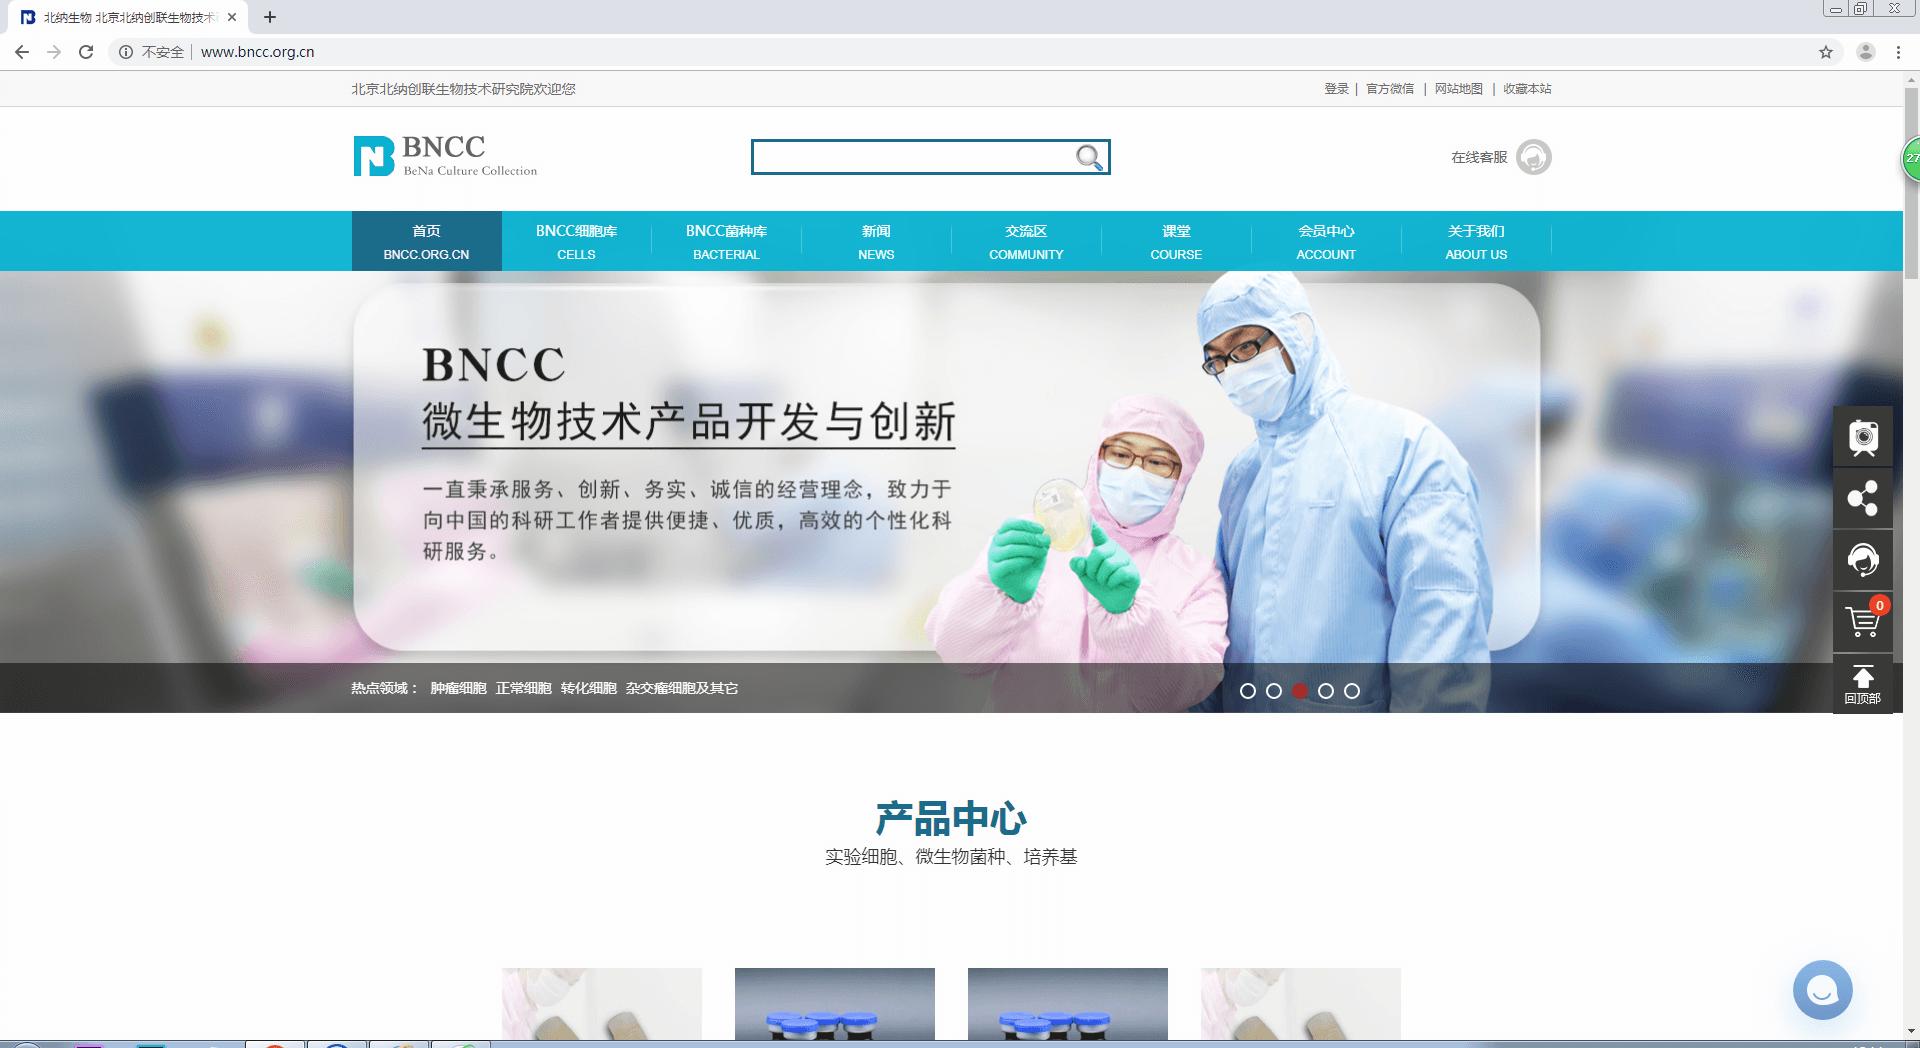 BNCC网站全新改版-fudajzx.com北纳标物网